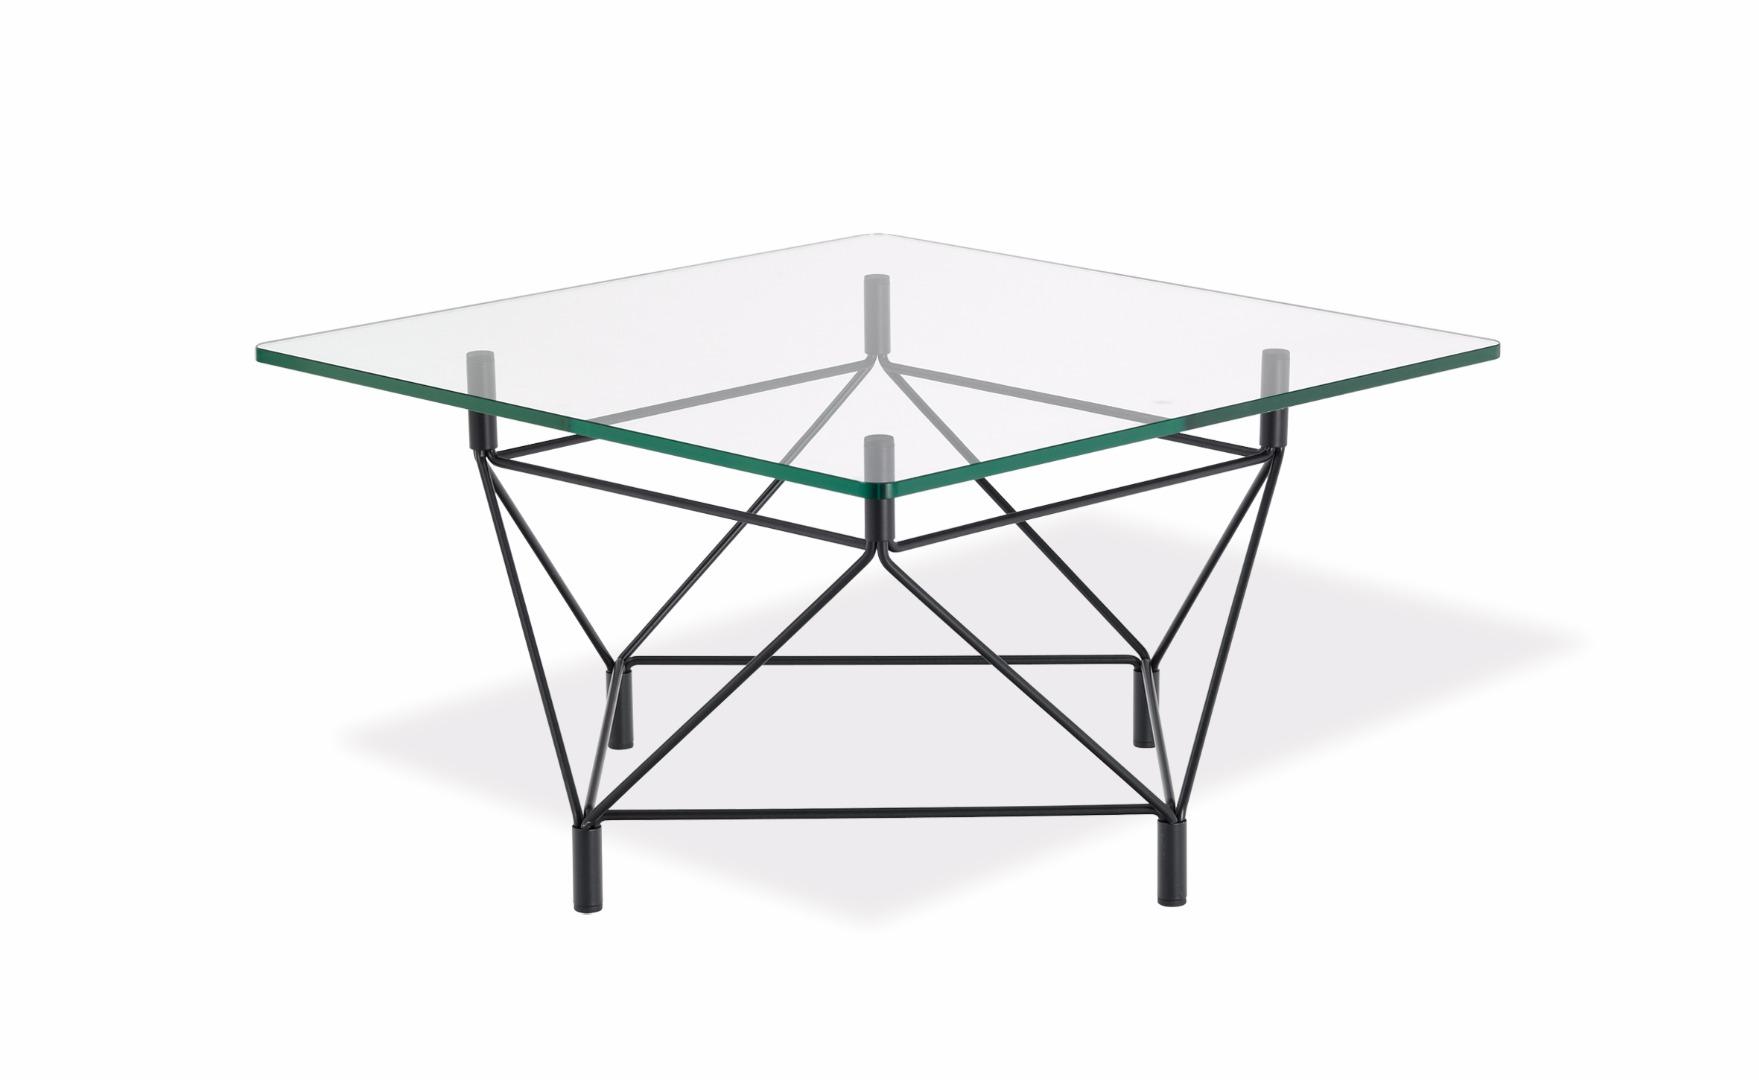 Spider soffbord fyrkantigt glas Bredaryds Möbler